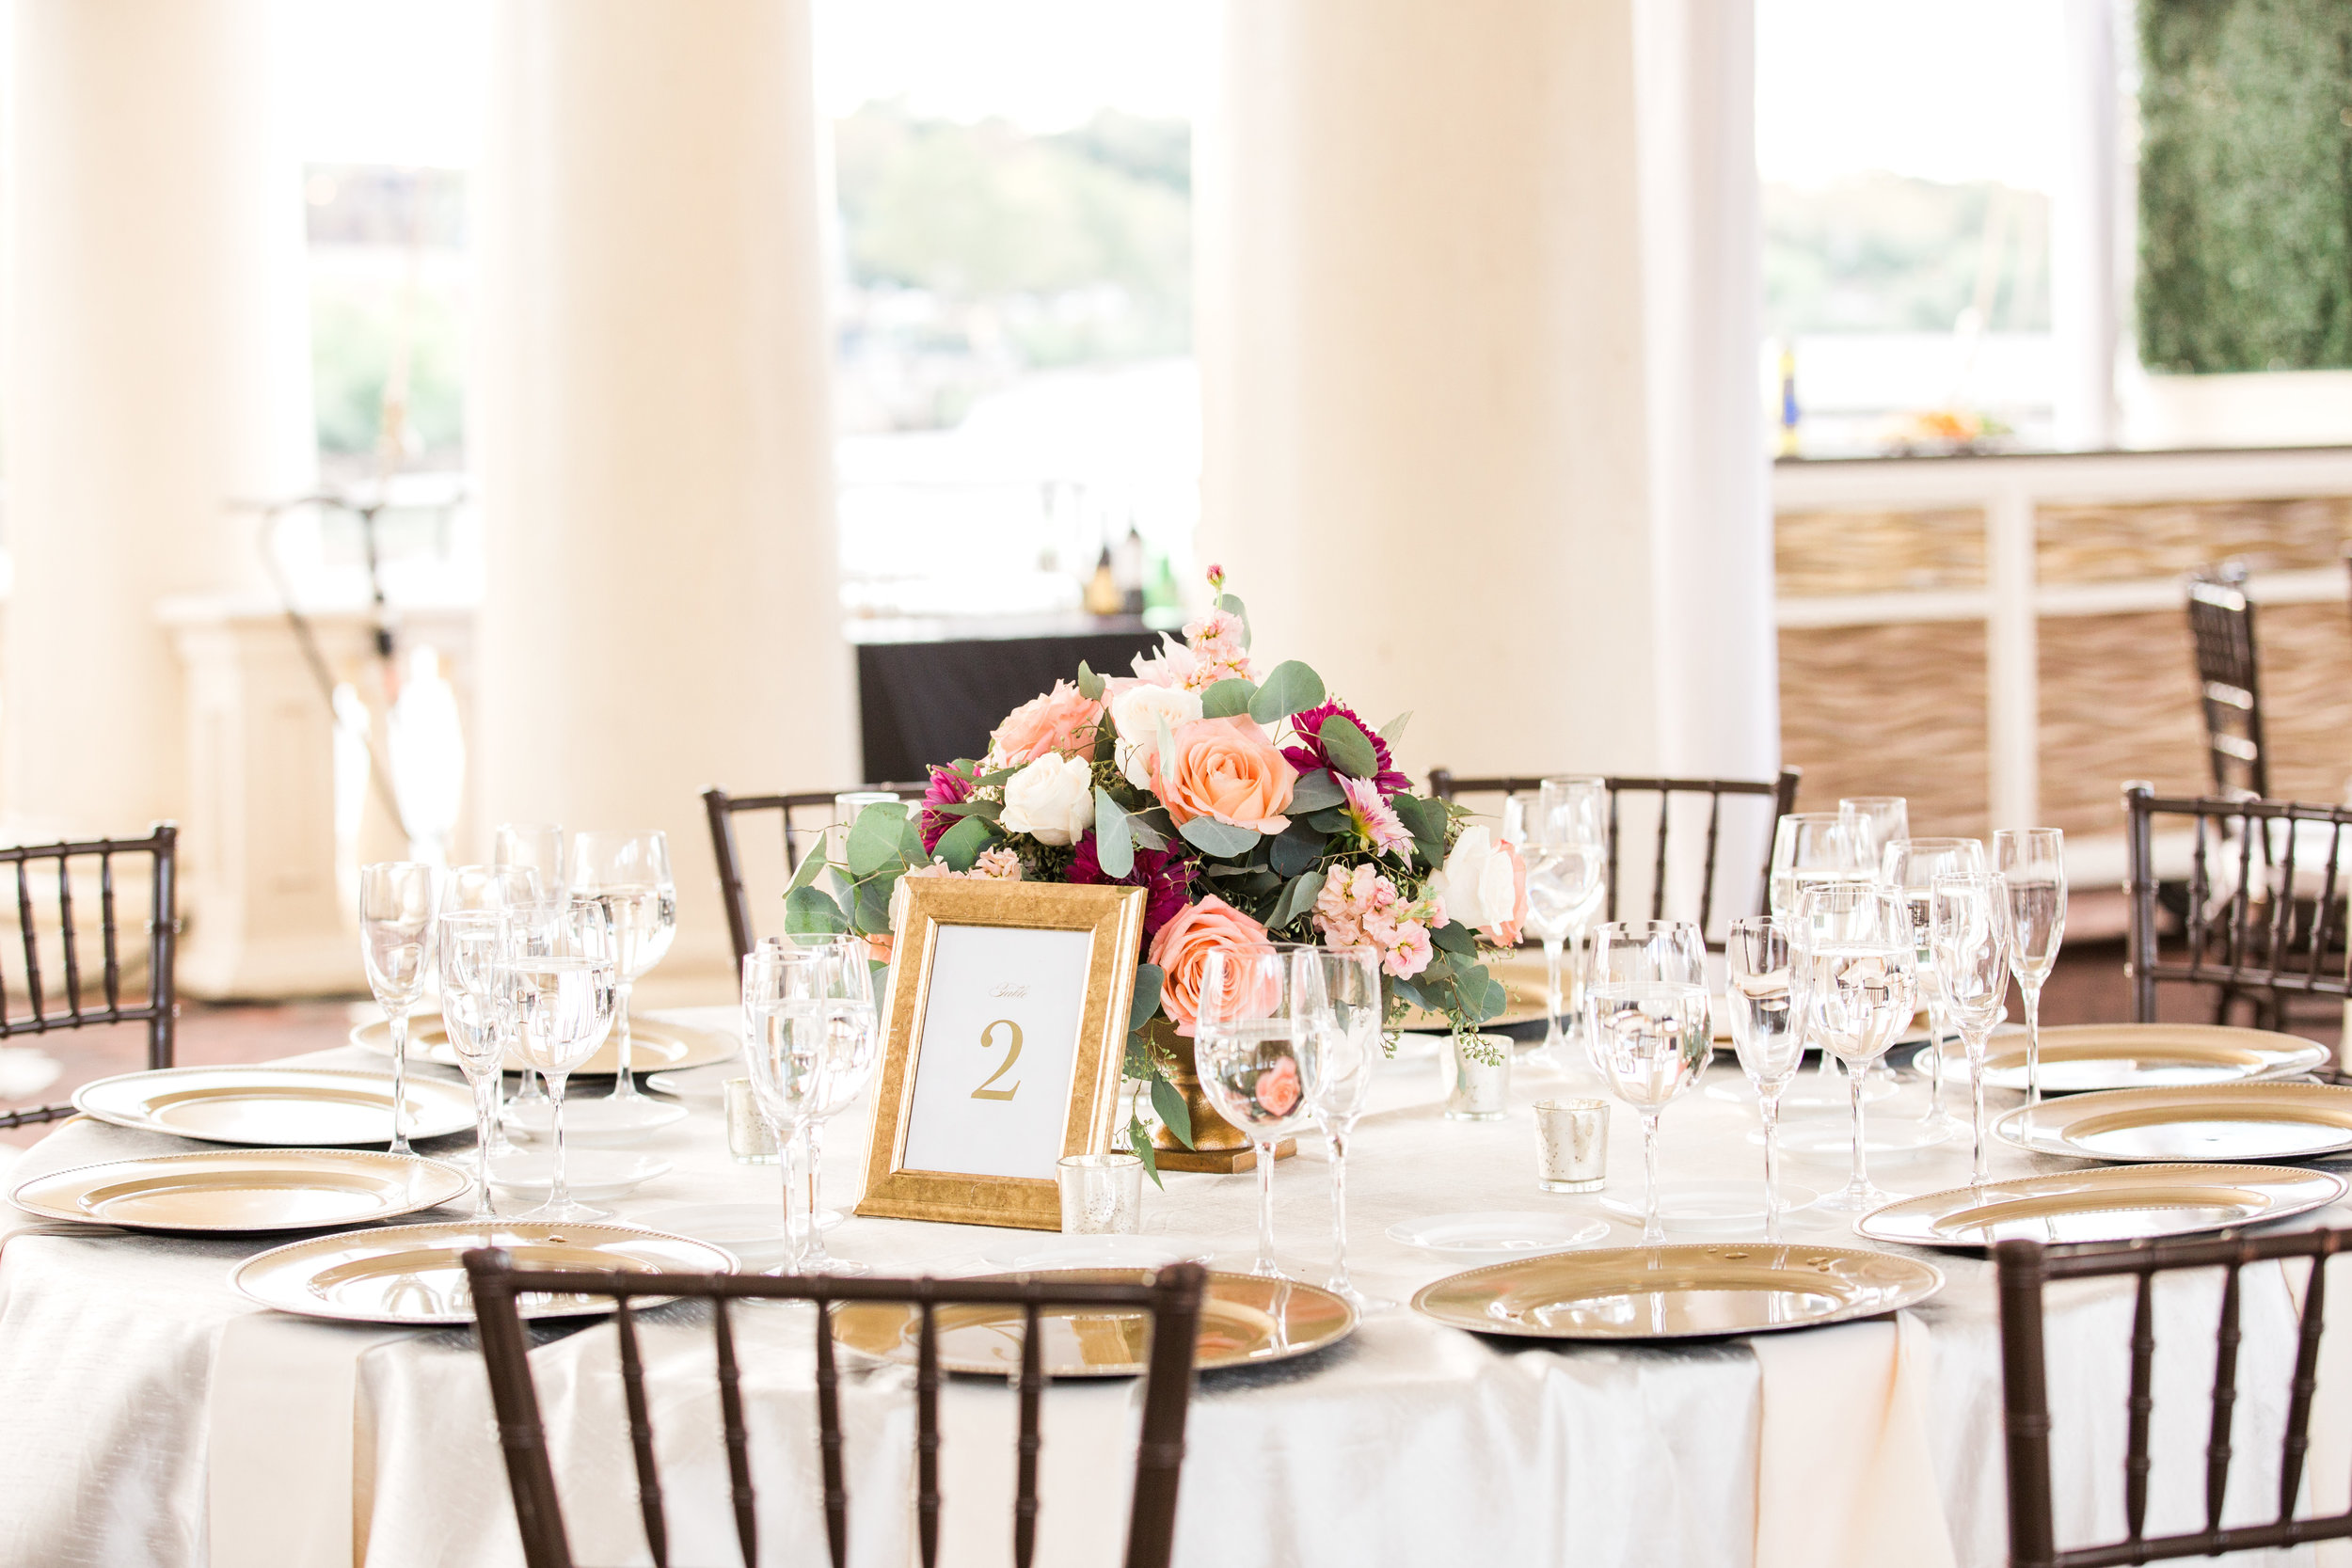 Hudson-Nichols-Black-Tie-Bride-Philadelphia-Waterworks-Wedding-Cescaphe-Reception-Floral-Details04.jpg